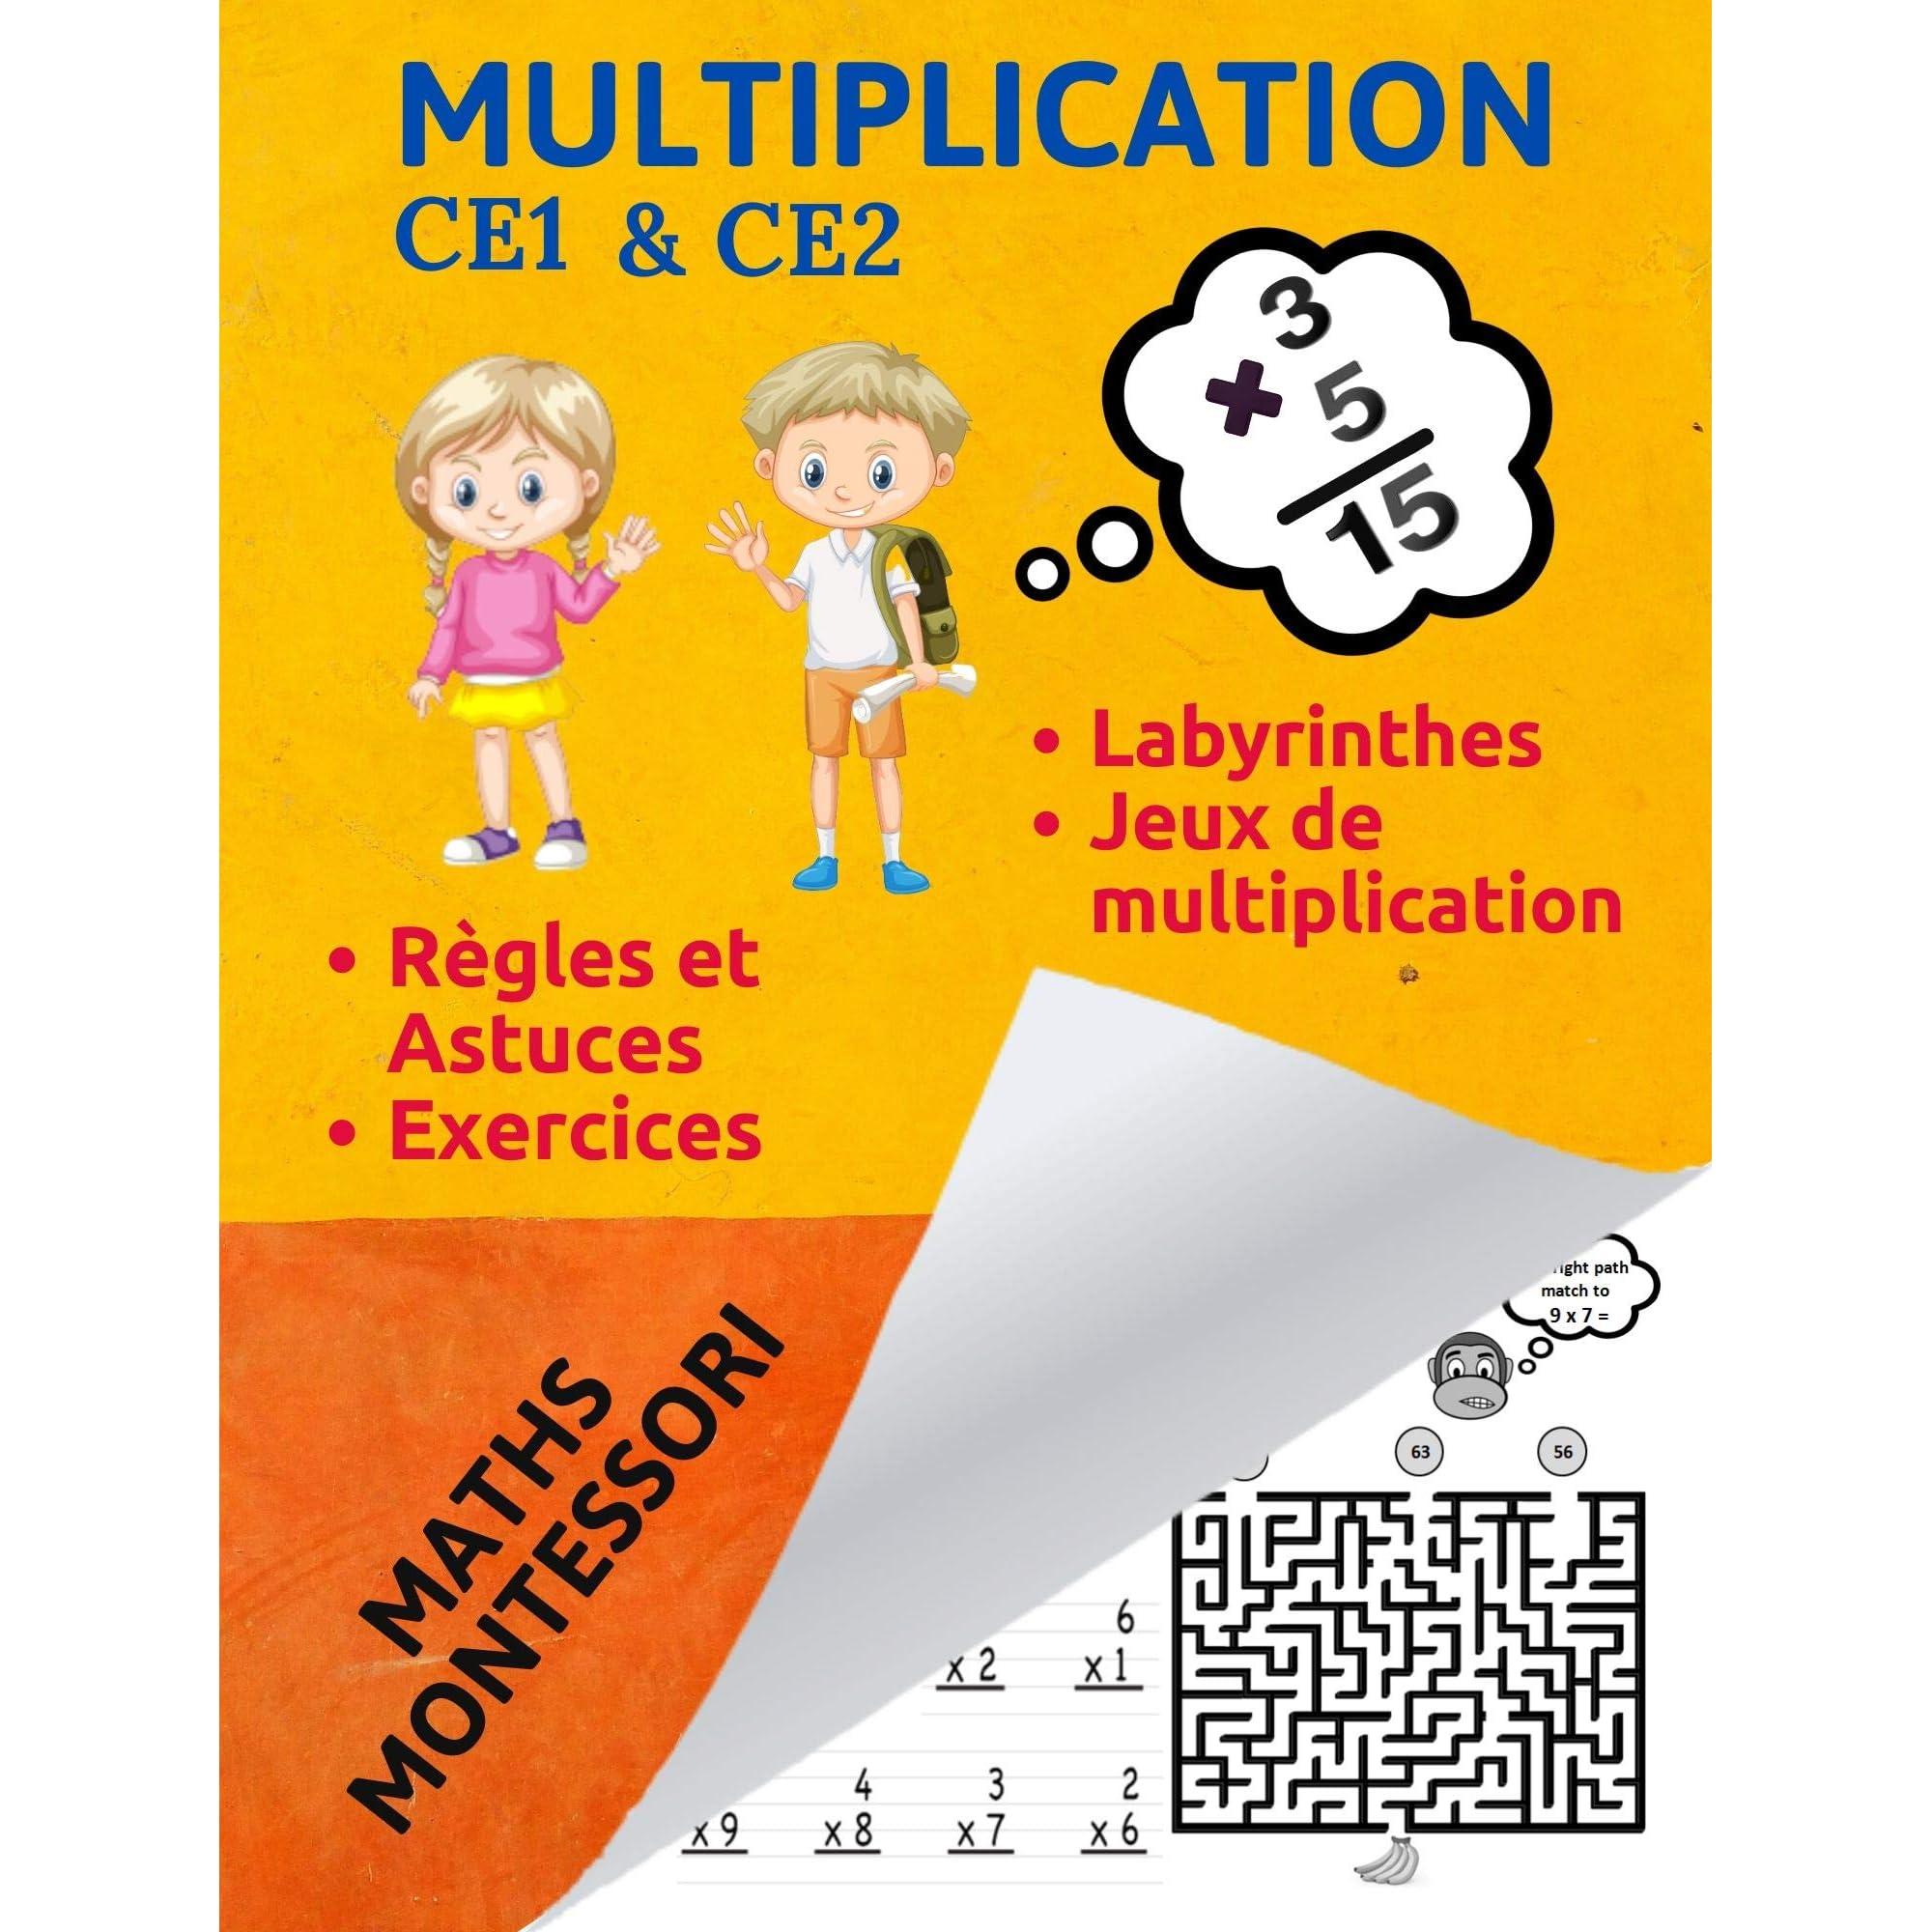 Multiplication Ce1 Multiplication Ce2 Math Ce1 Math Ce2 By Multiplication Montessori